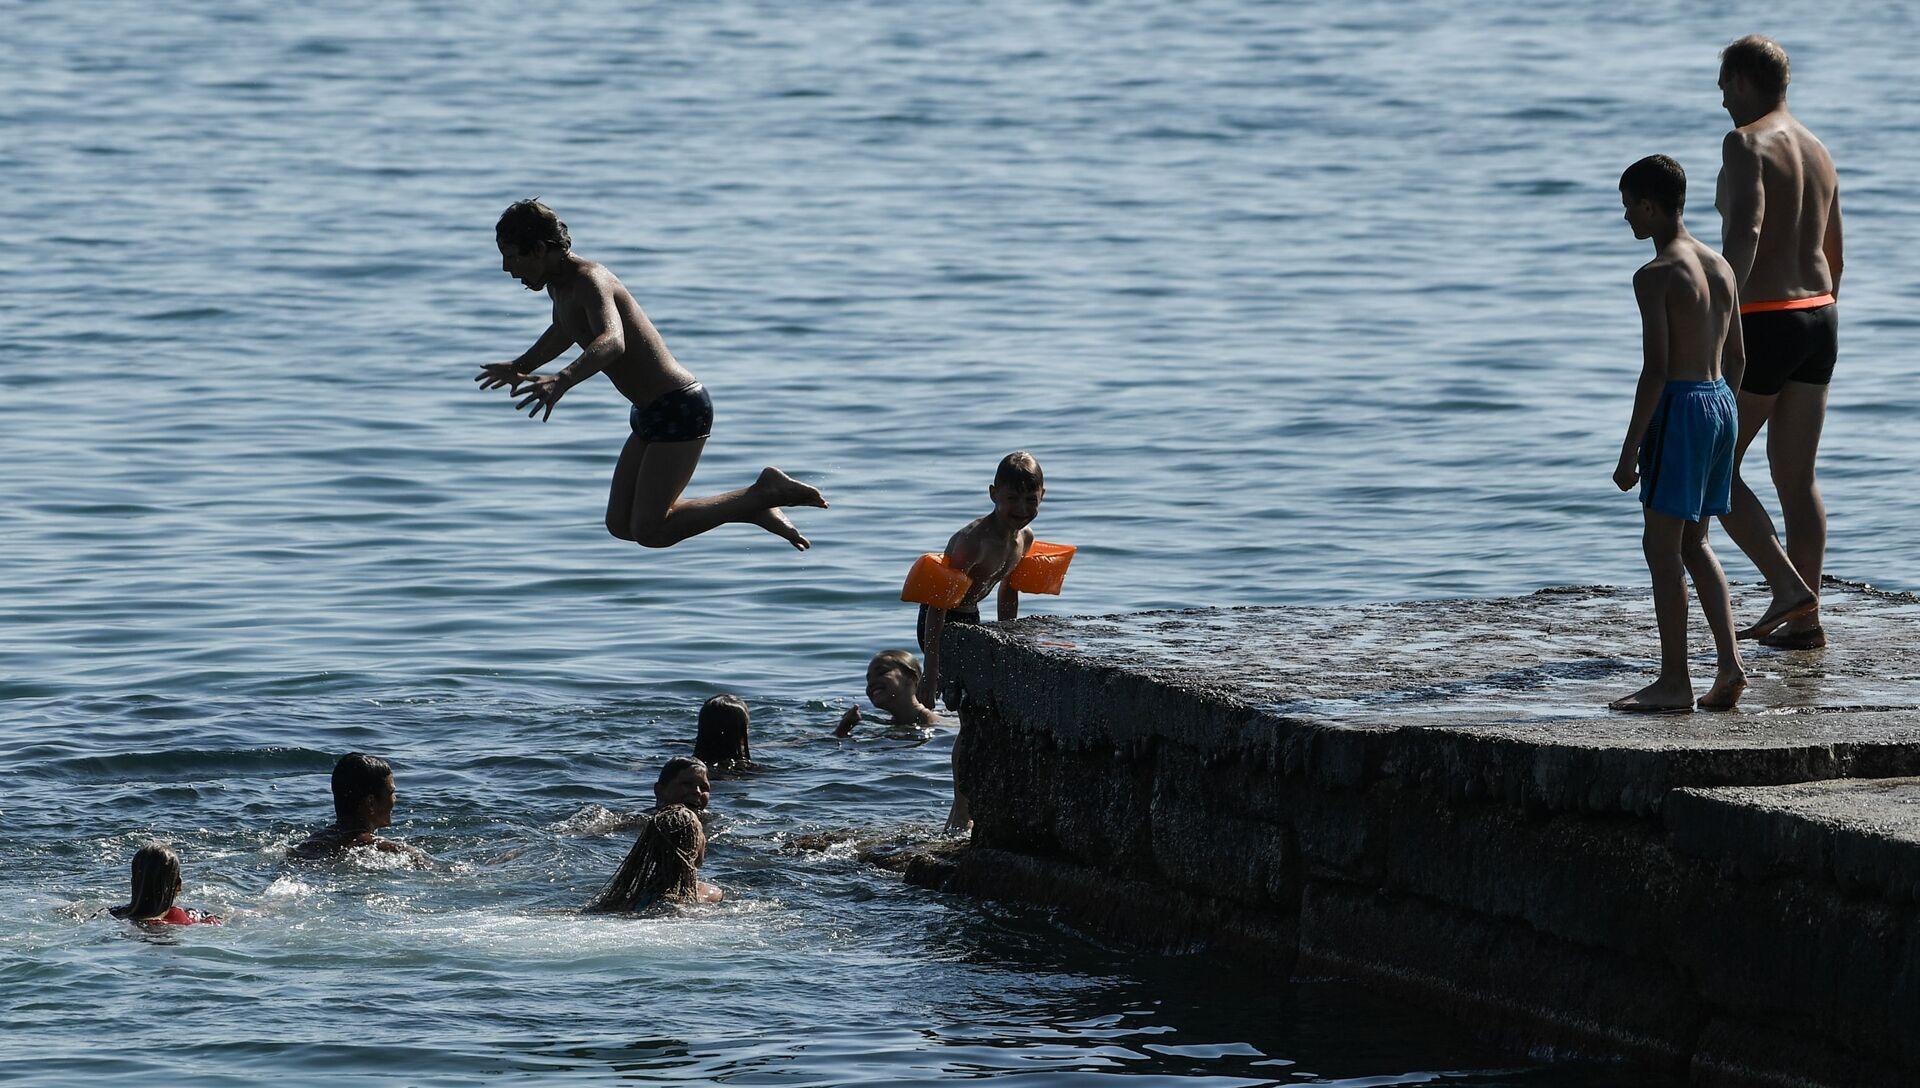 Дети прыгают с пирса на пляже в Судаке - РИА Новости, 1920, 09.07.2021